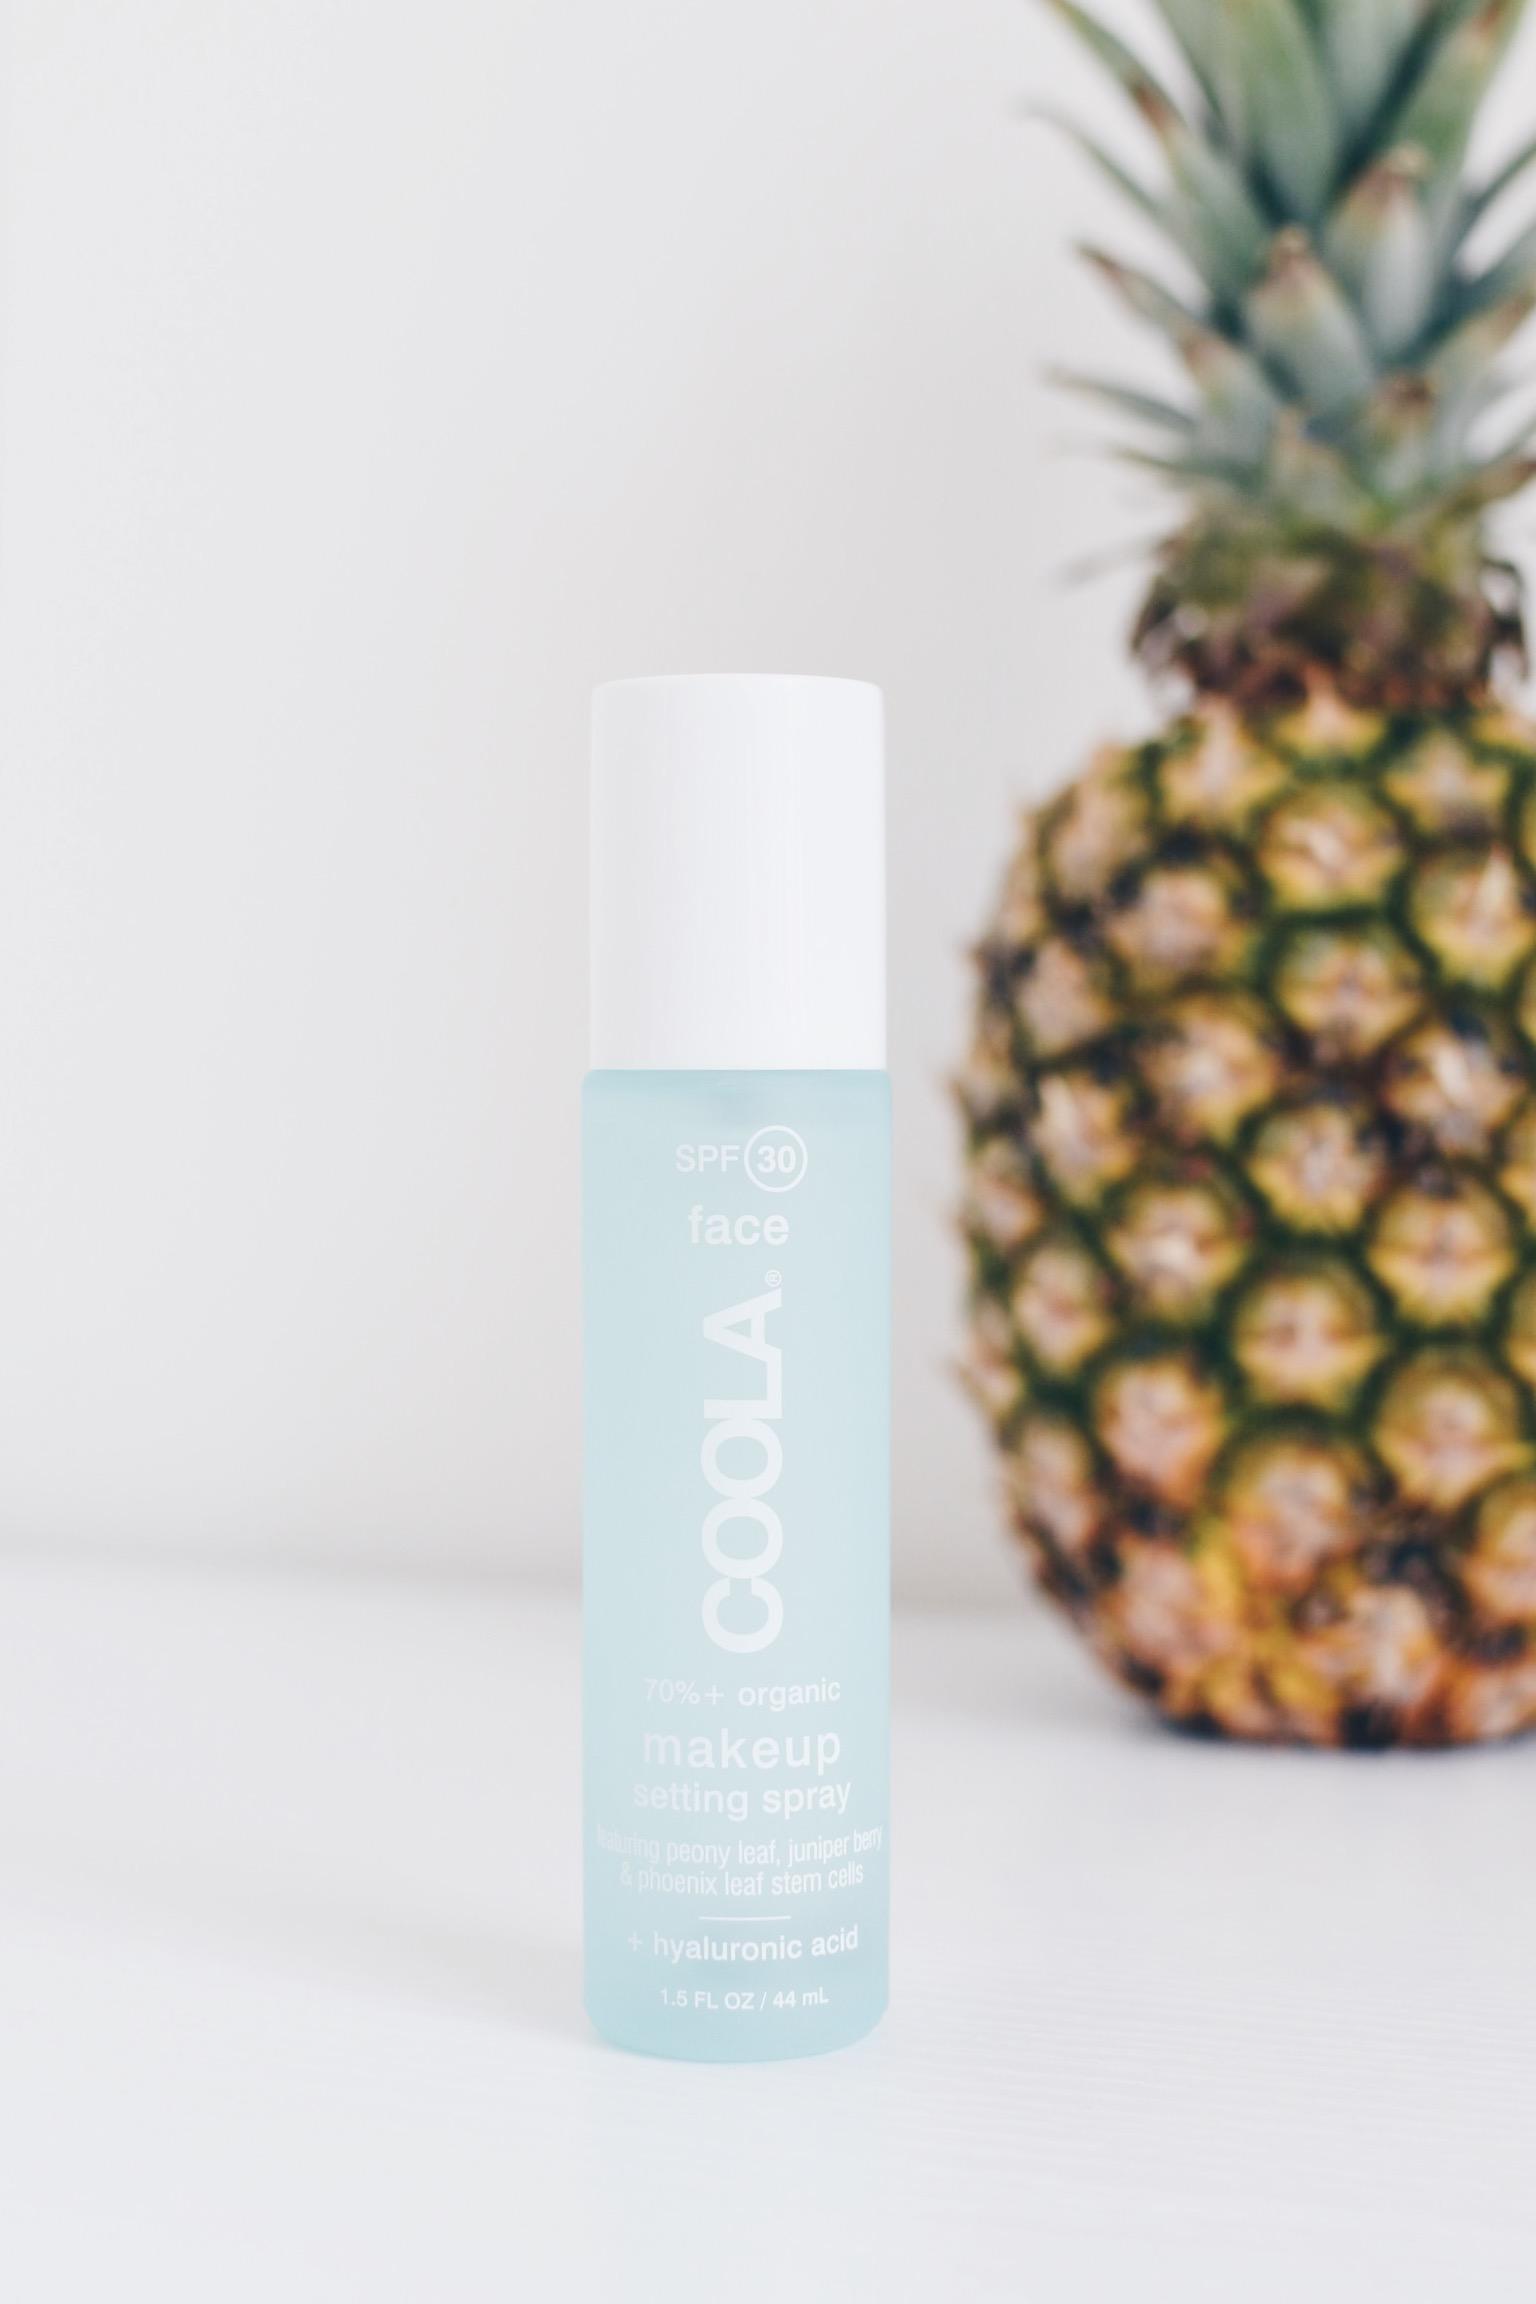 Coola Suncare Makeup Setting Spray Review